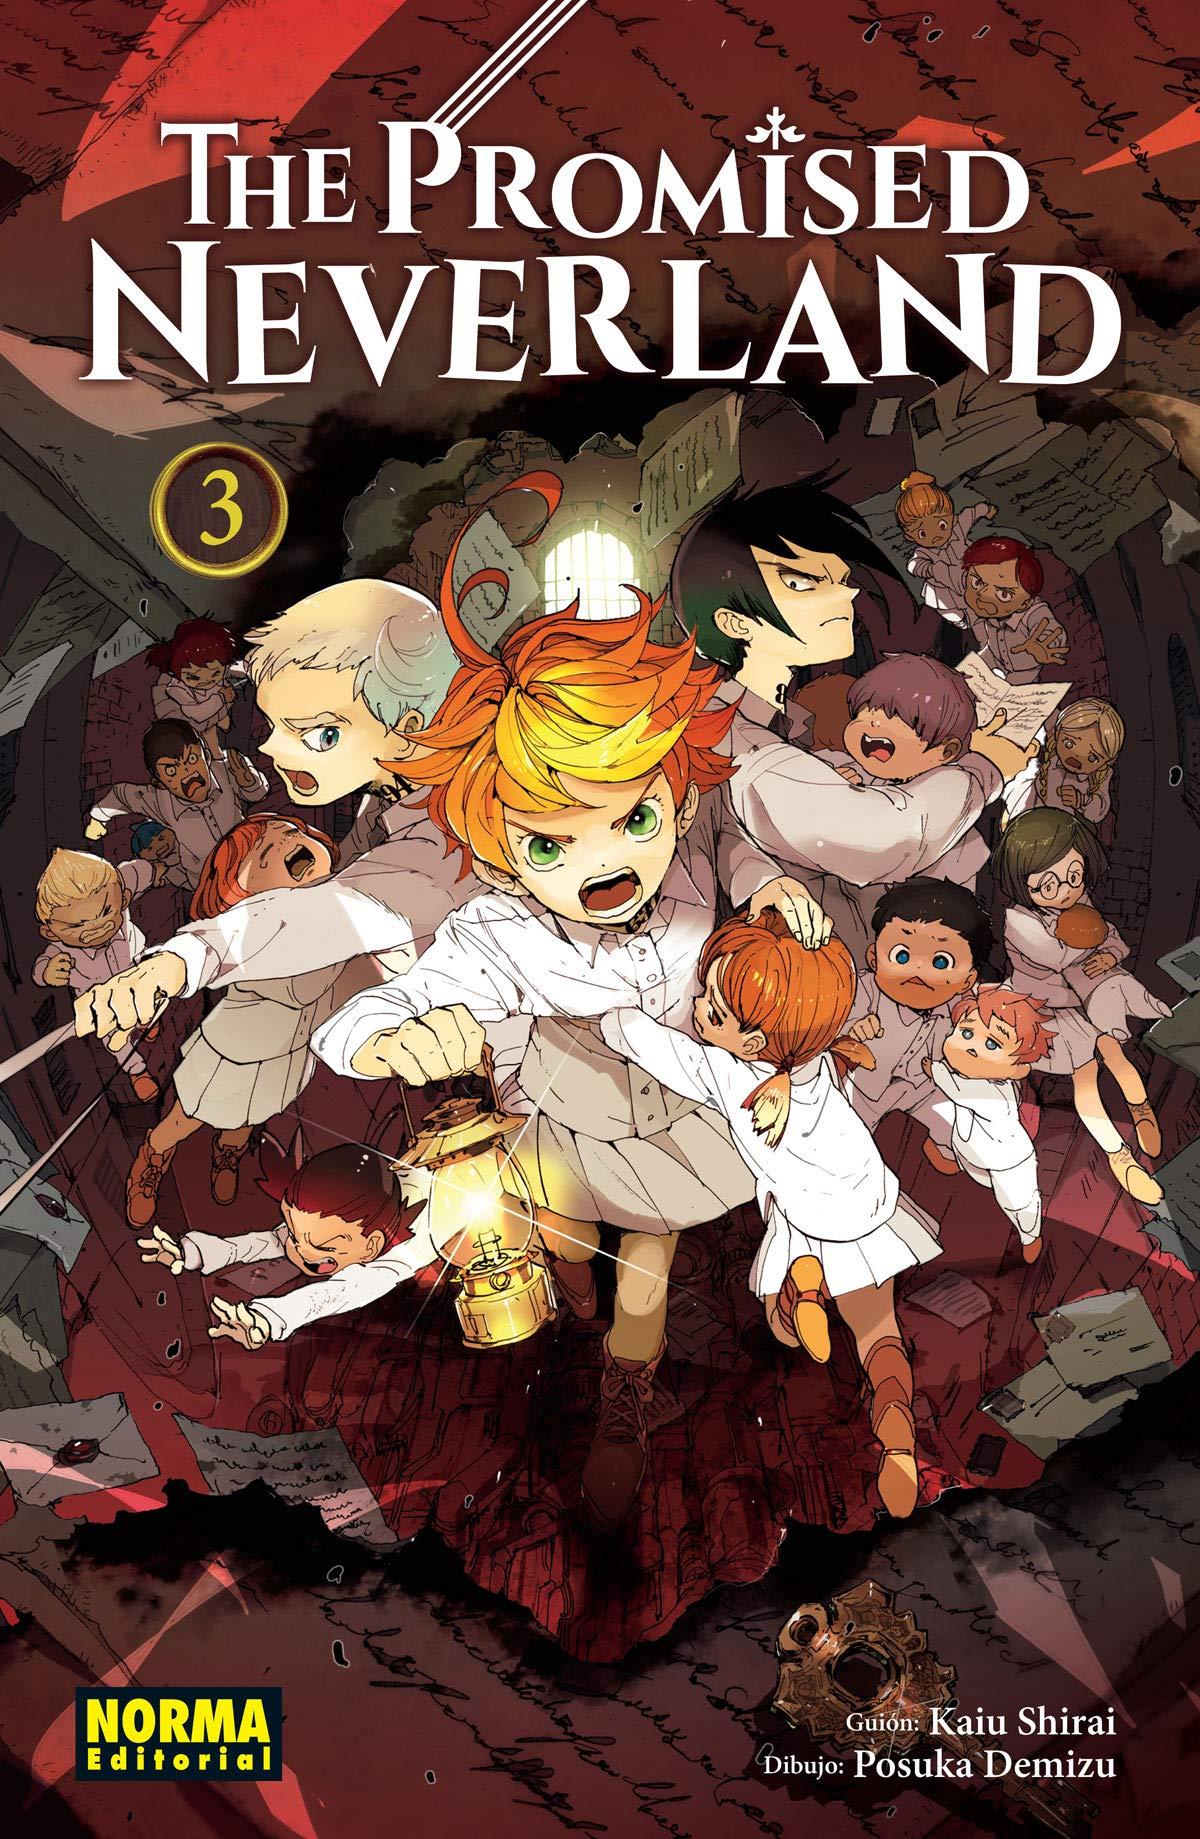 The Promised Neverland 3 Tapa blanda – 24 ago 2018 Posuka Demizu Kiau Shirai Norma Comics 846793090X FX